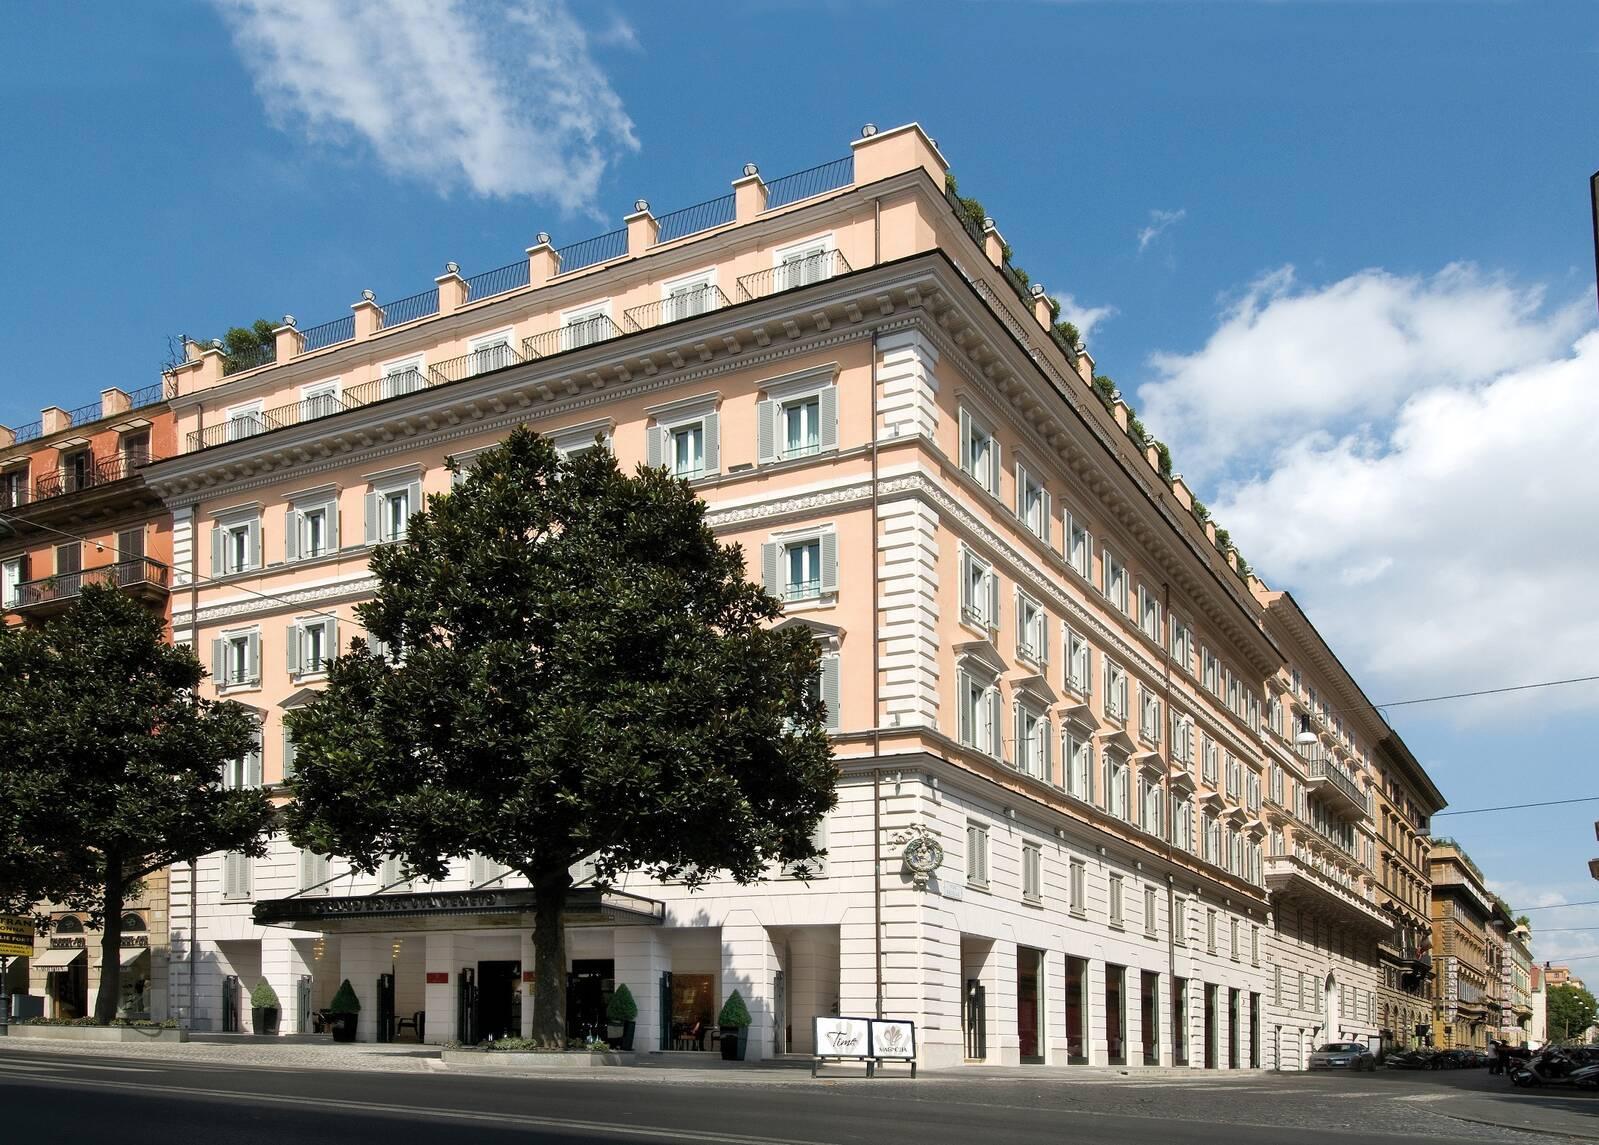 Grand Hotel Via Veneto Rome Italie Exterieur